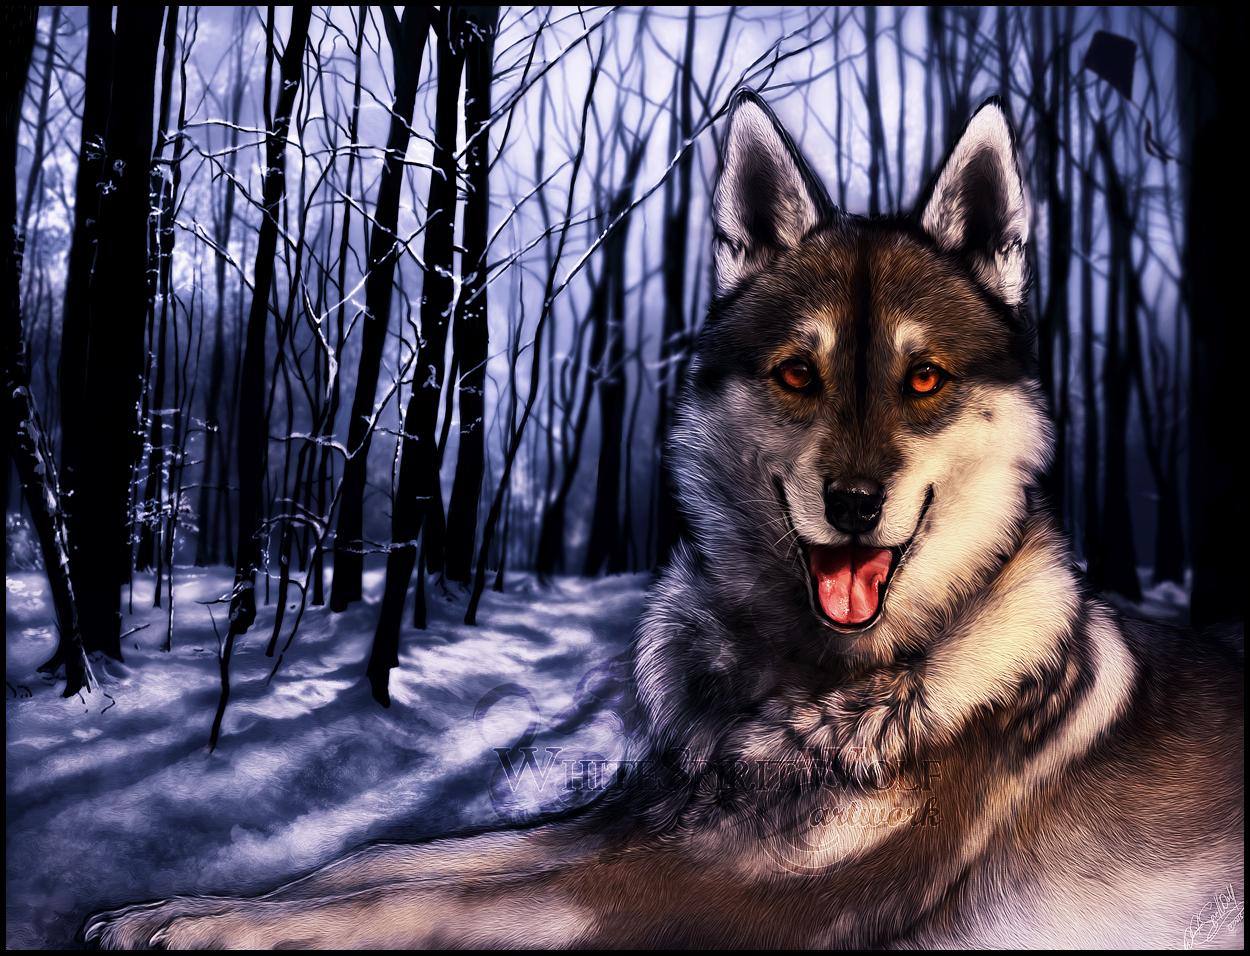 http://fc00.deviantart.net/fs70/f/2014/037/3/b/_charity_____snowy_forest____by_whitespiritwolf-d75b8y2.png